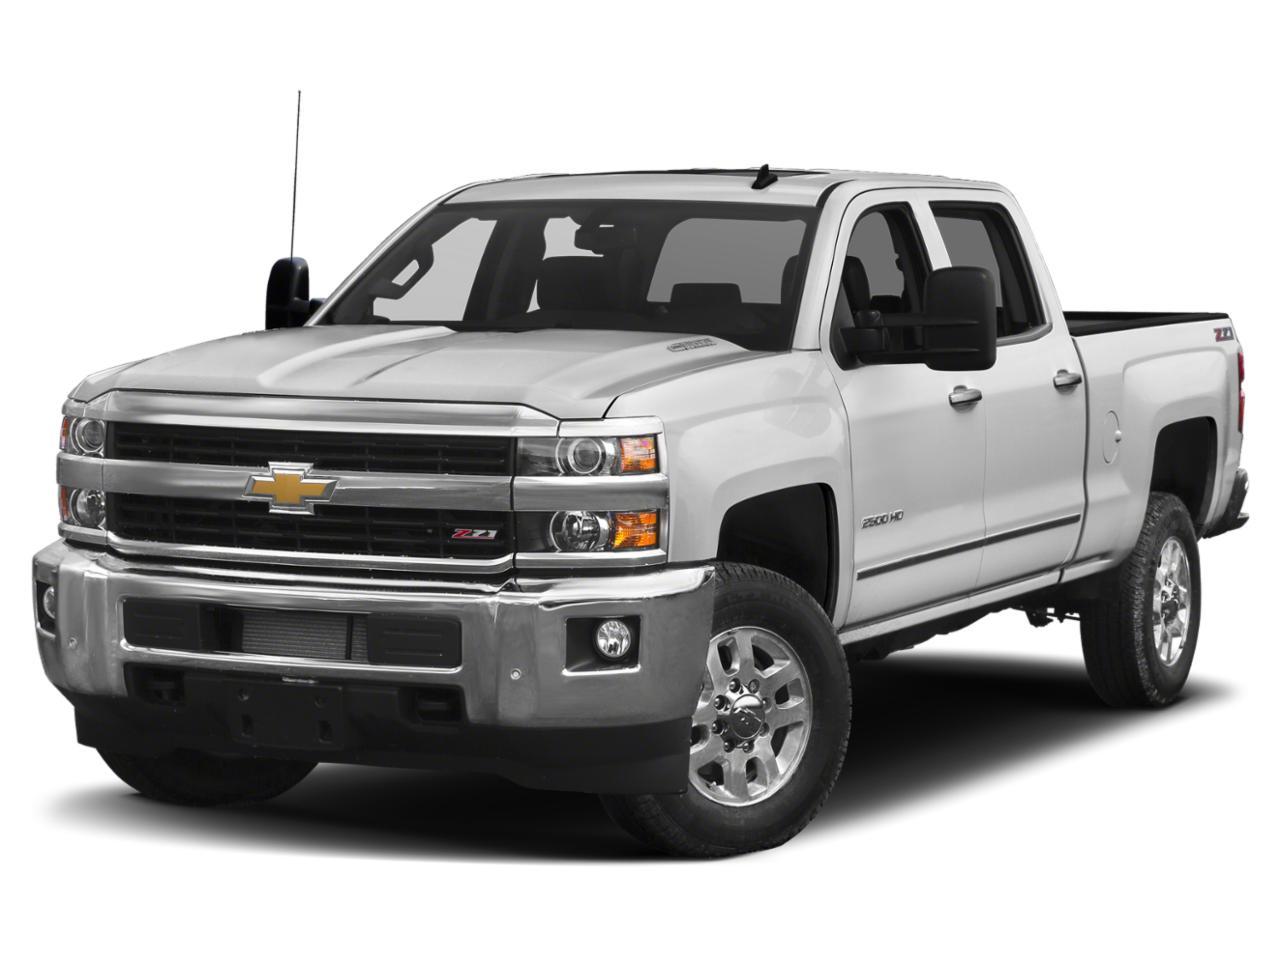 2017 Chevrolet Silverado 3500HD Vehicle Photo in TERRYVILLE, CT 06786-5904